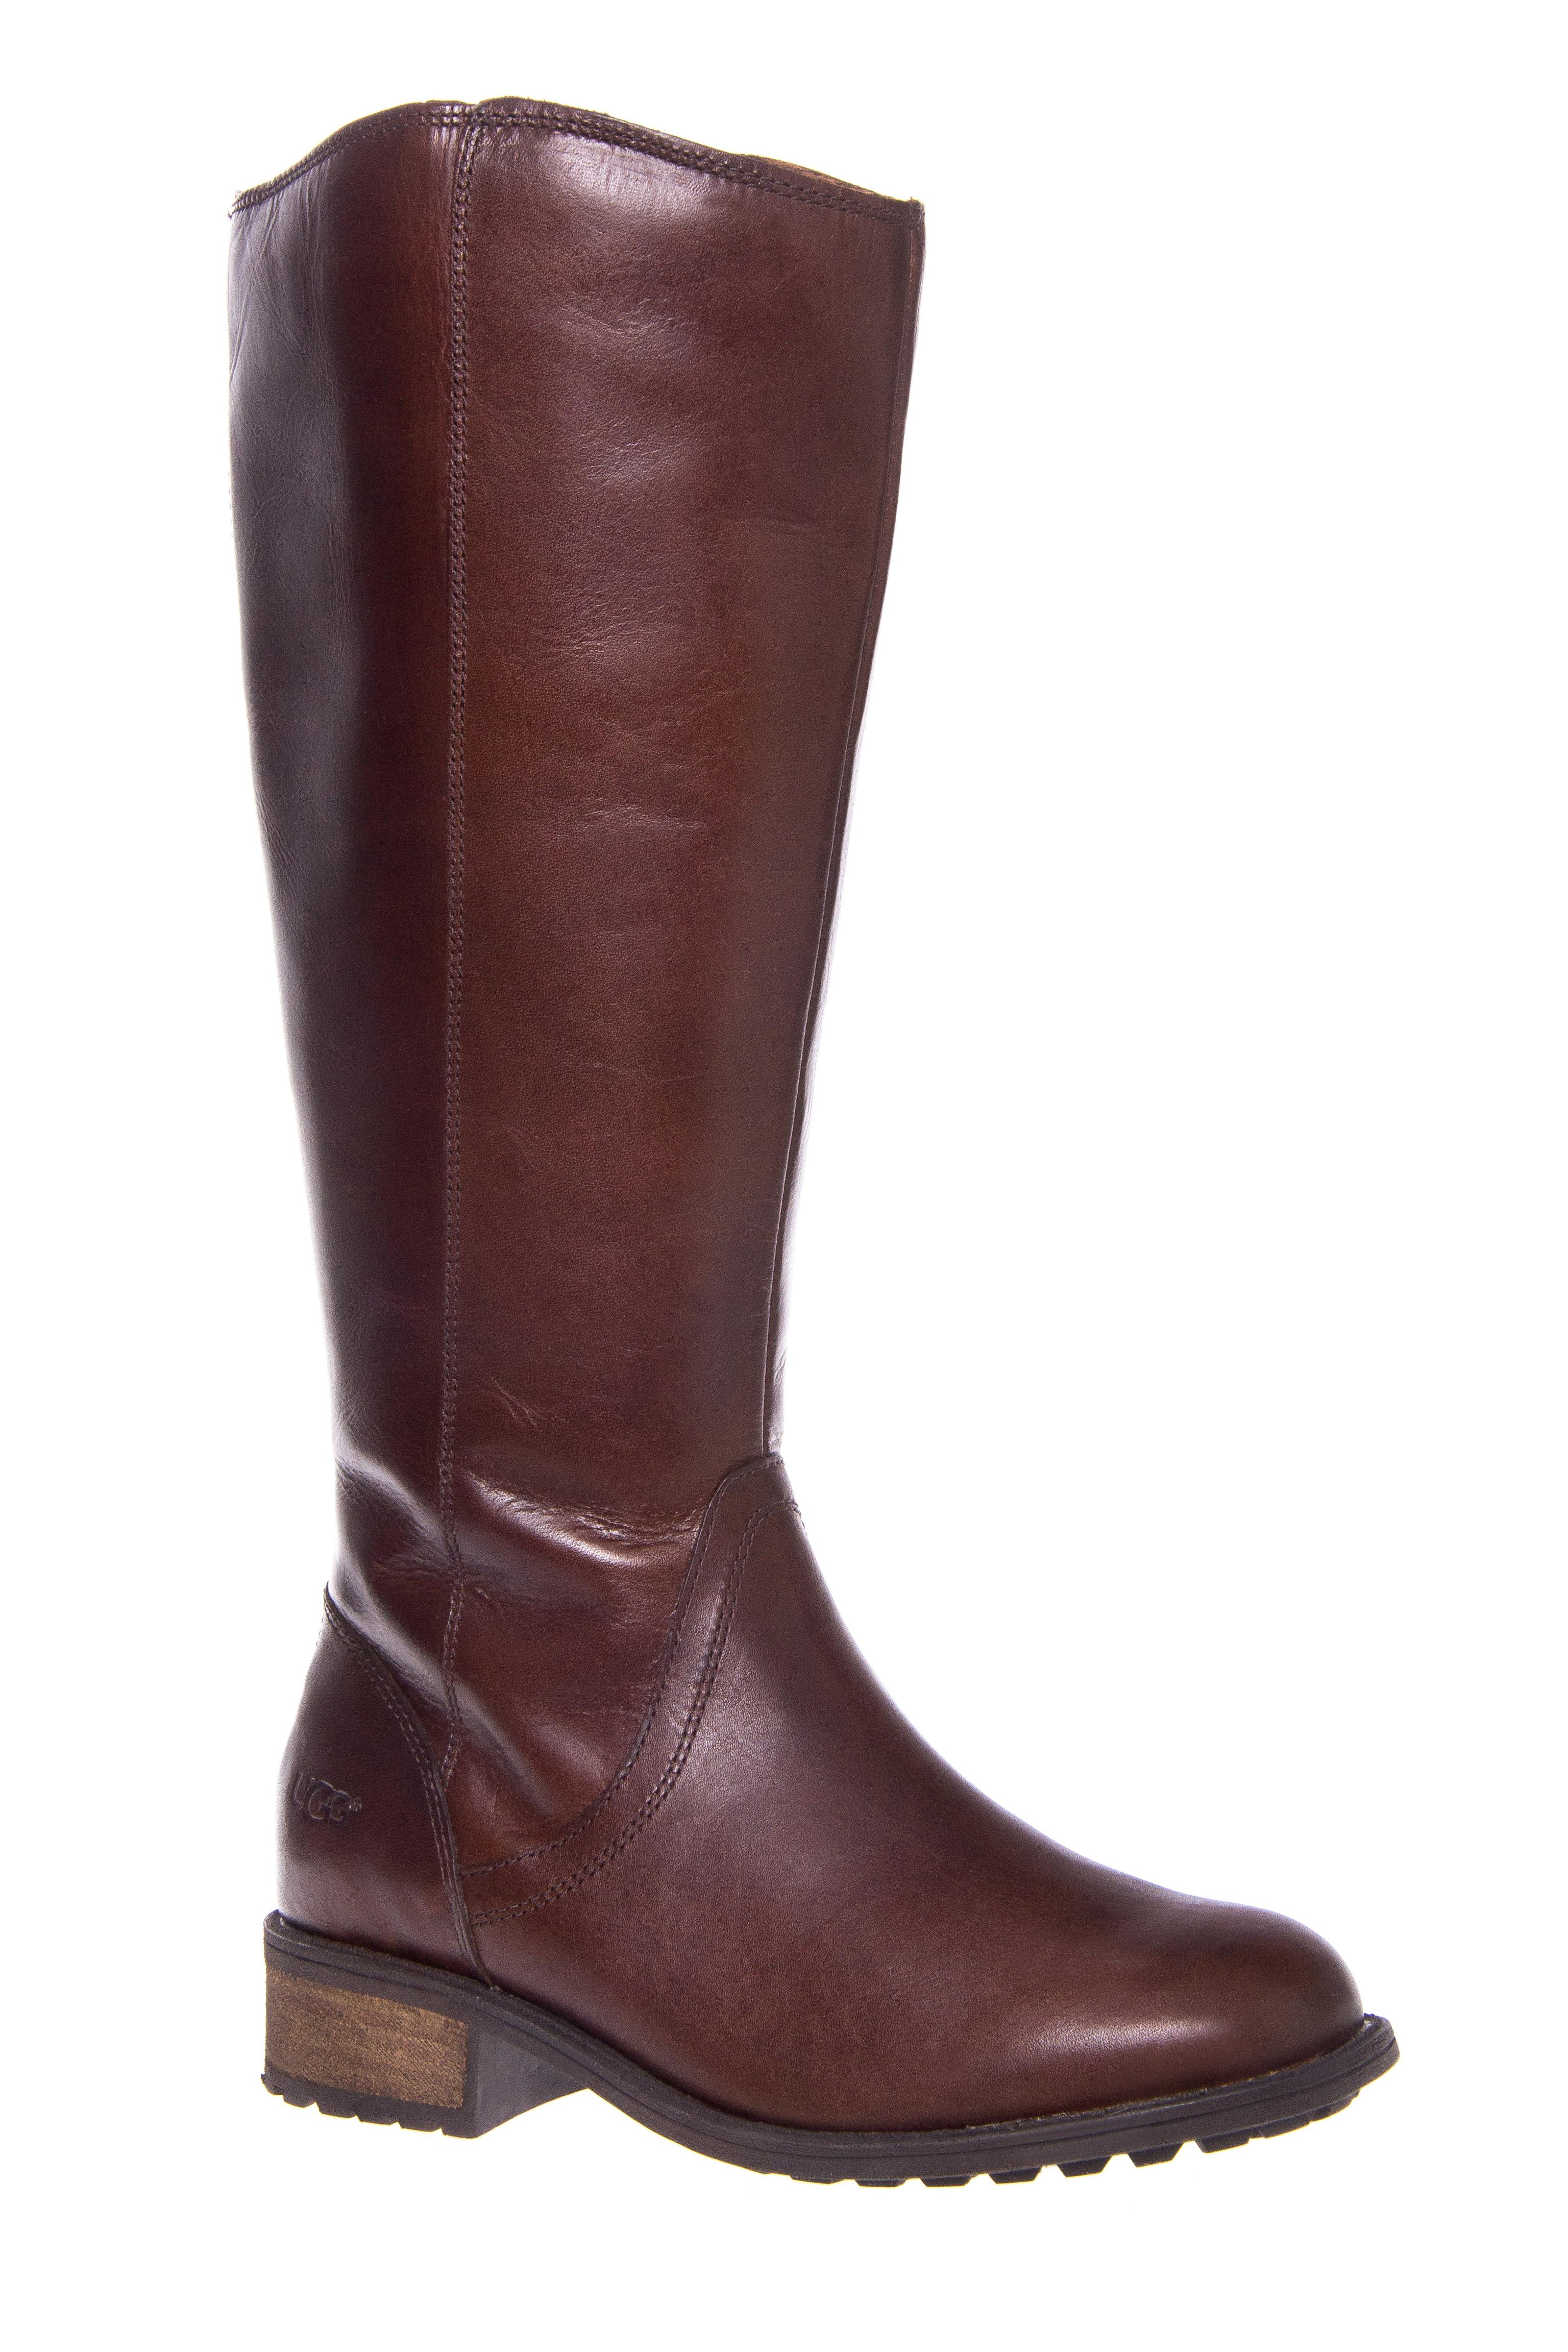 e9d76521cc4 UPC 887278936800 - UGG Seldon (Dark Chestnut Leather) Women's Boots ...